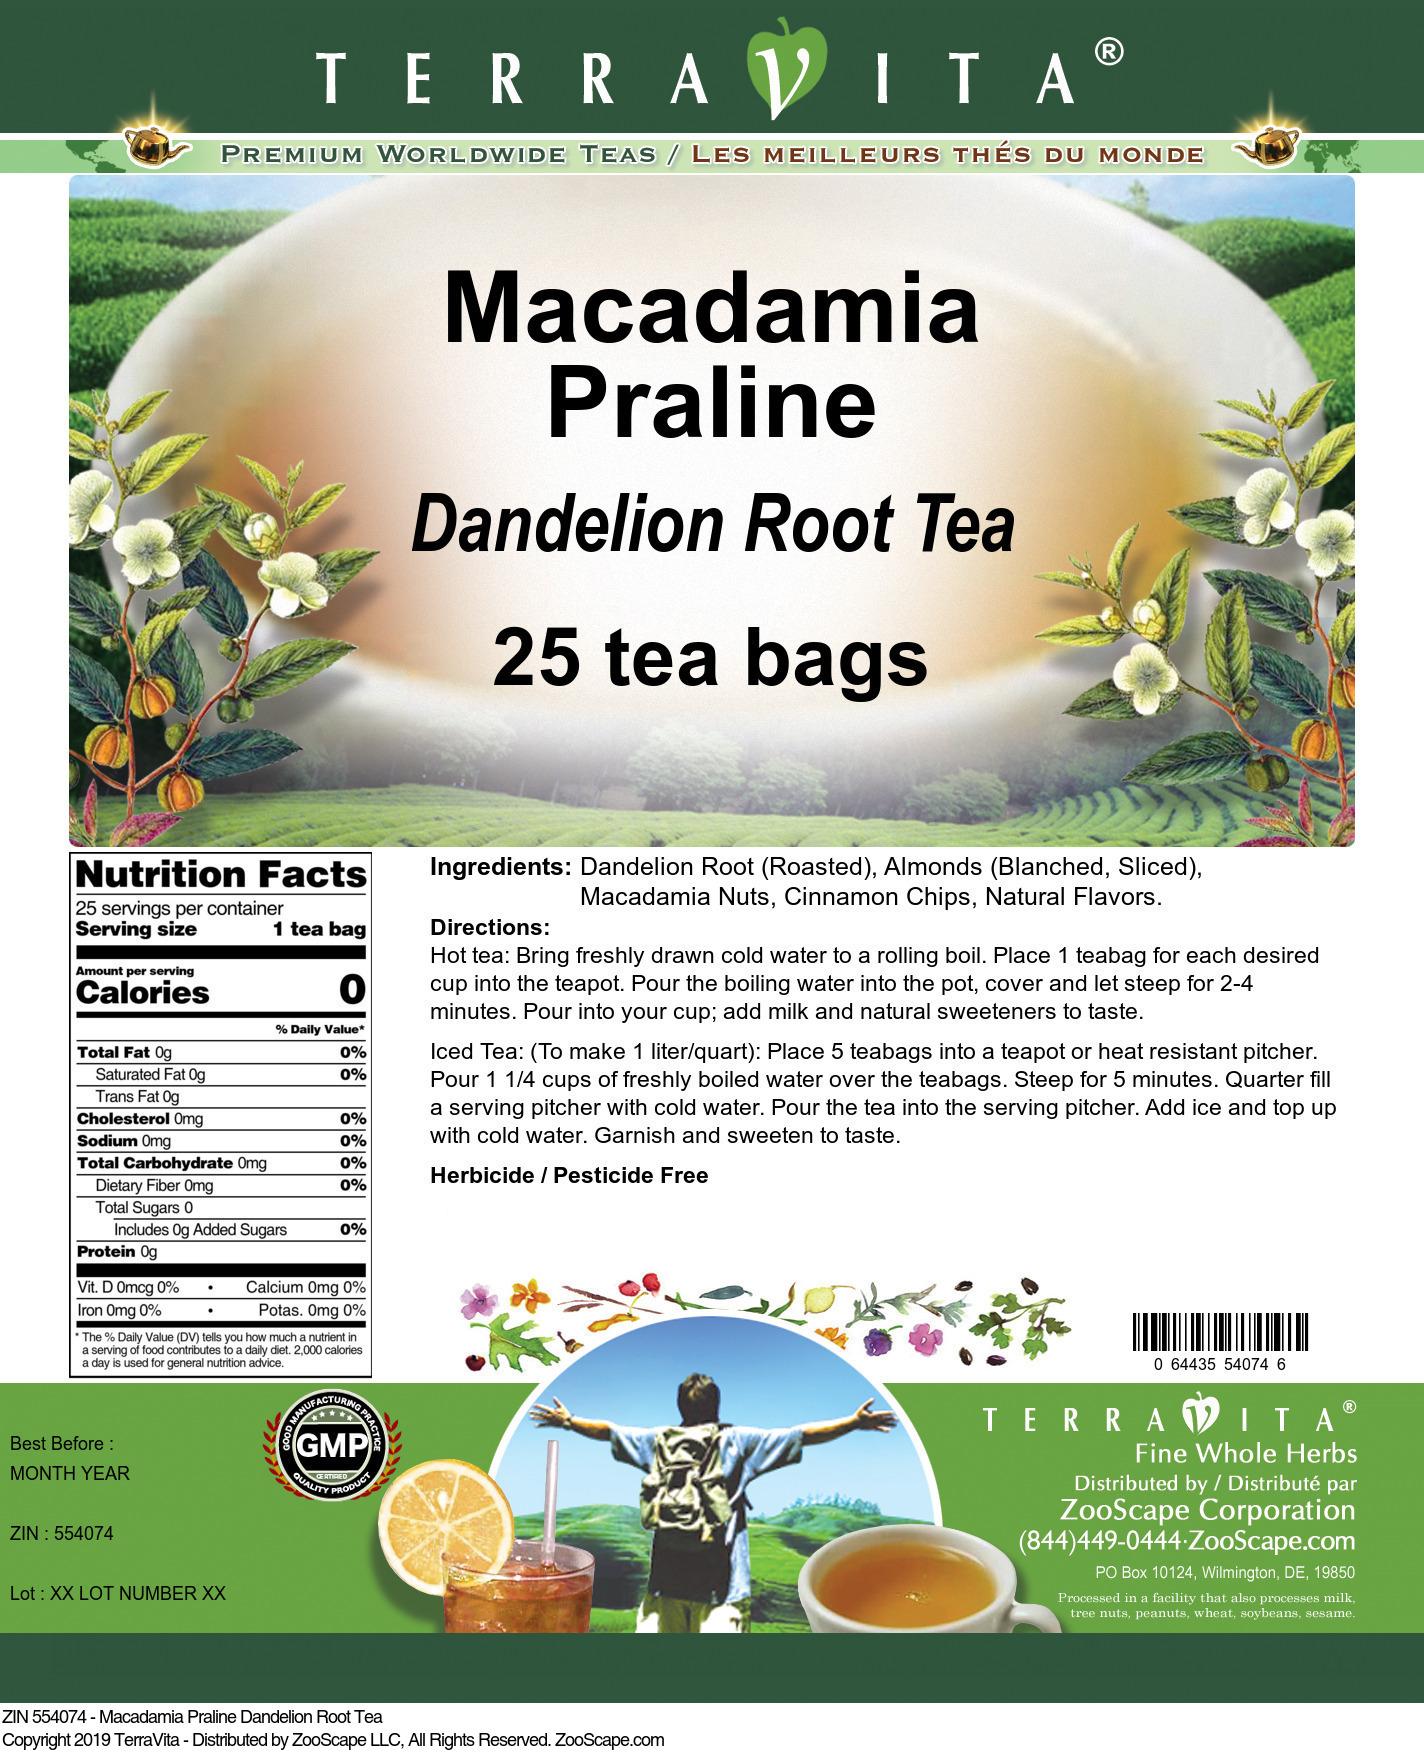 Macadamia Praline Dandelion Root Tea